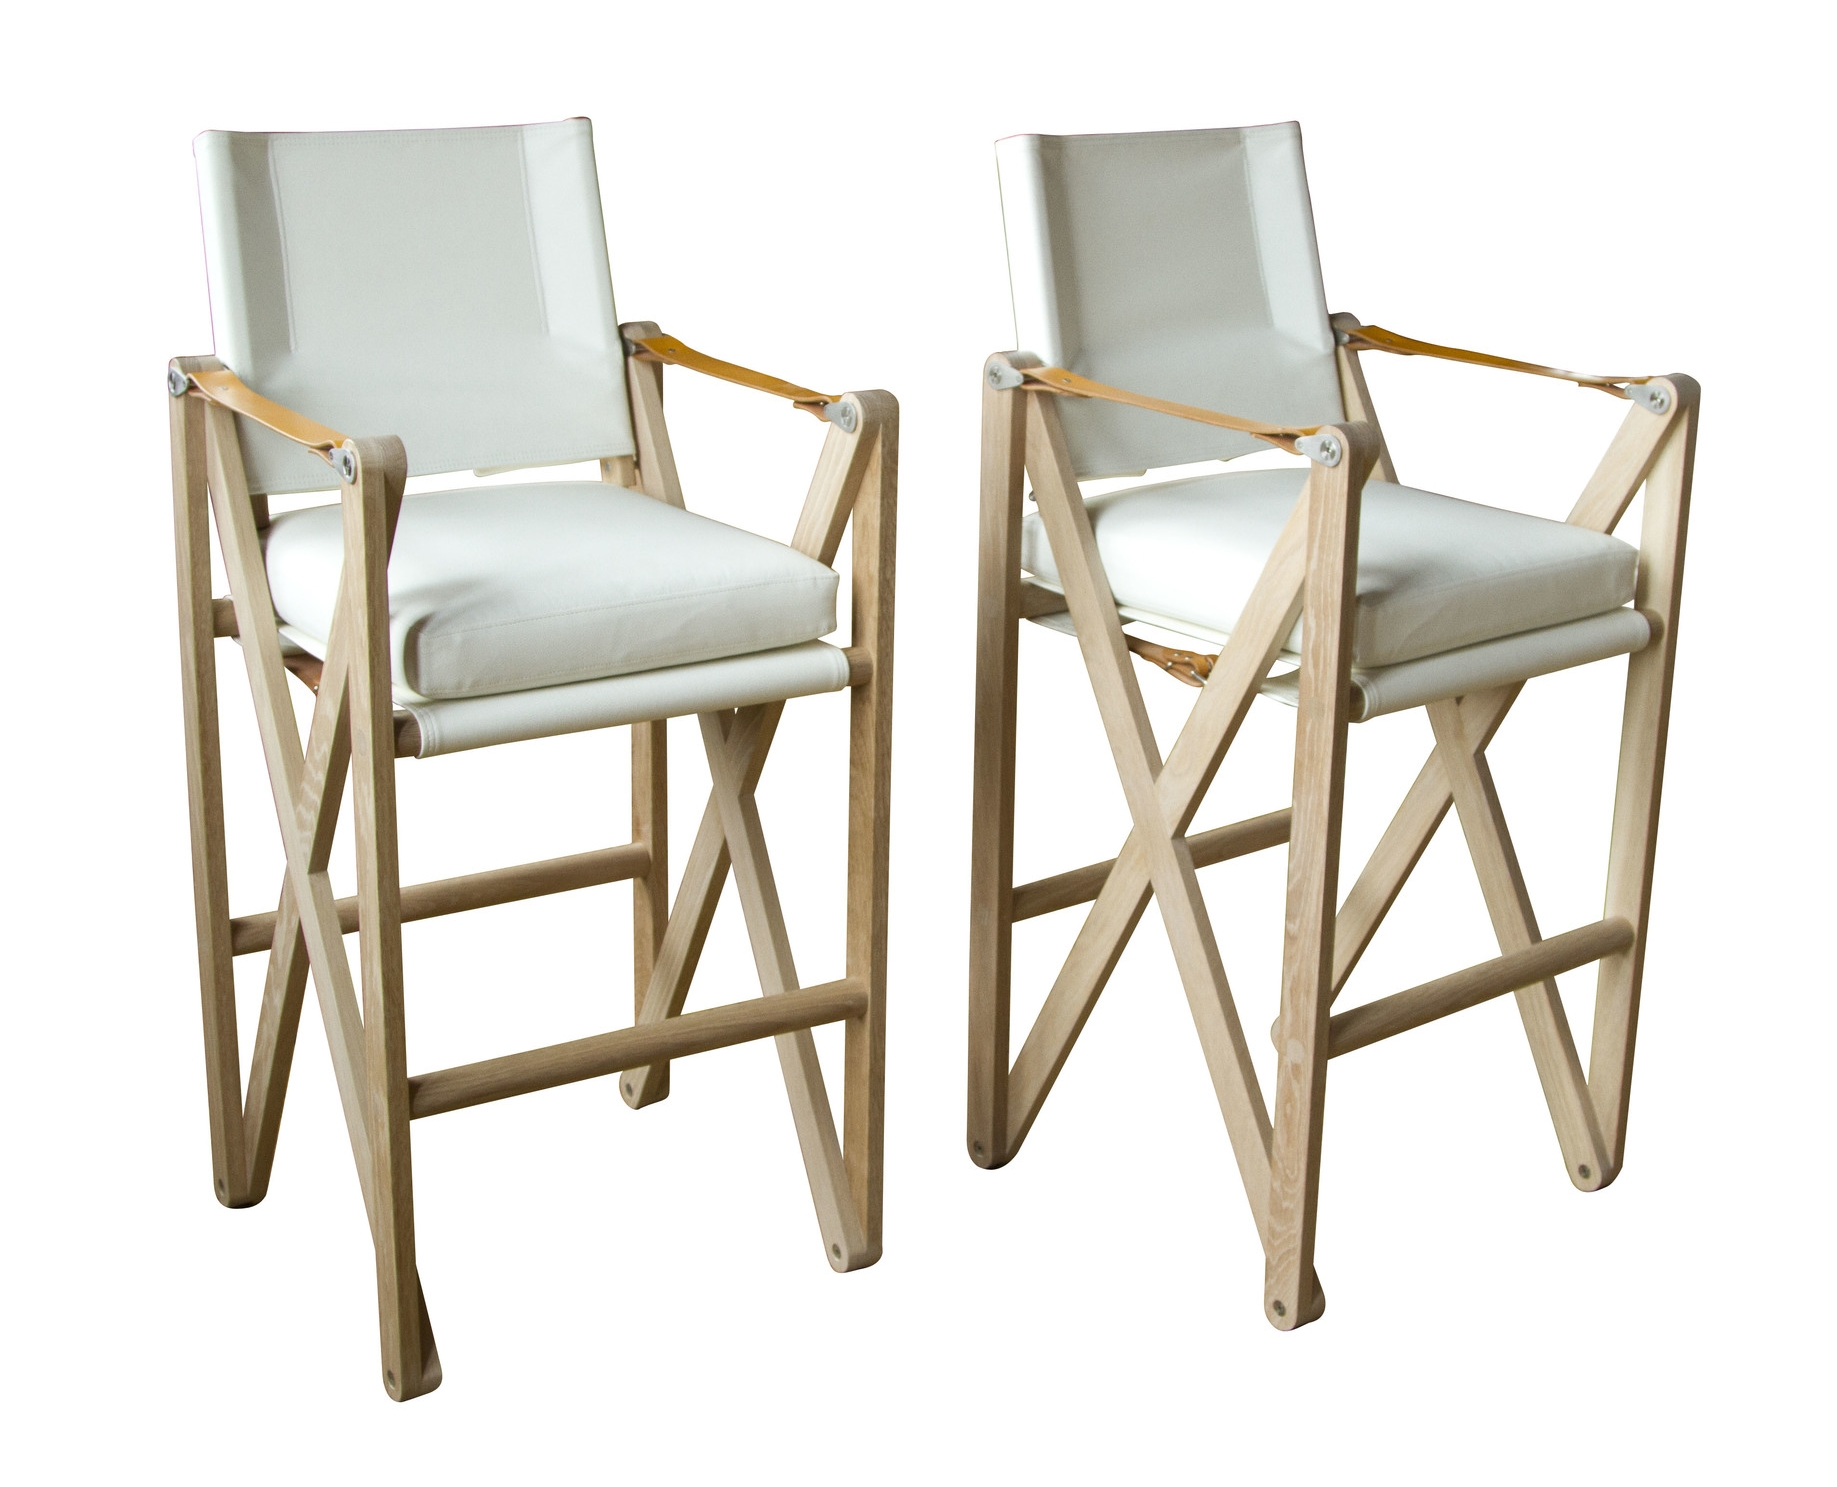 MacLaren Bar Chair - Narrow